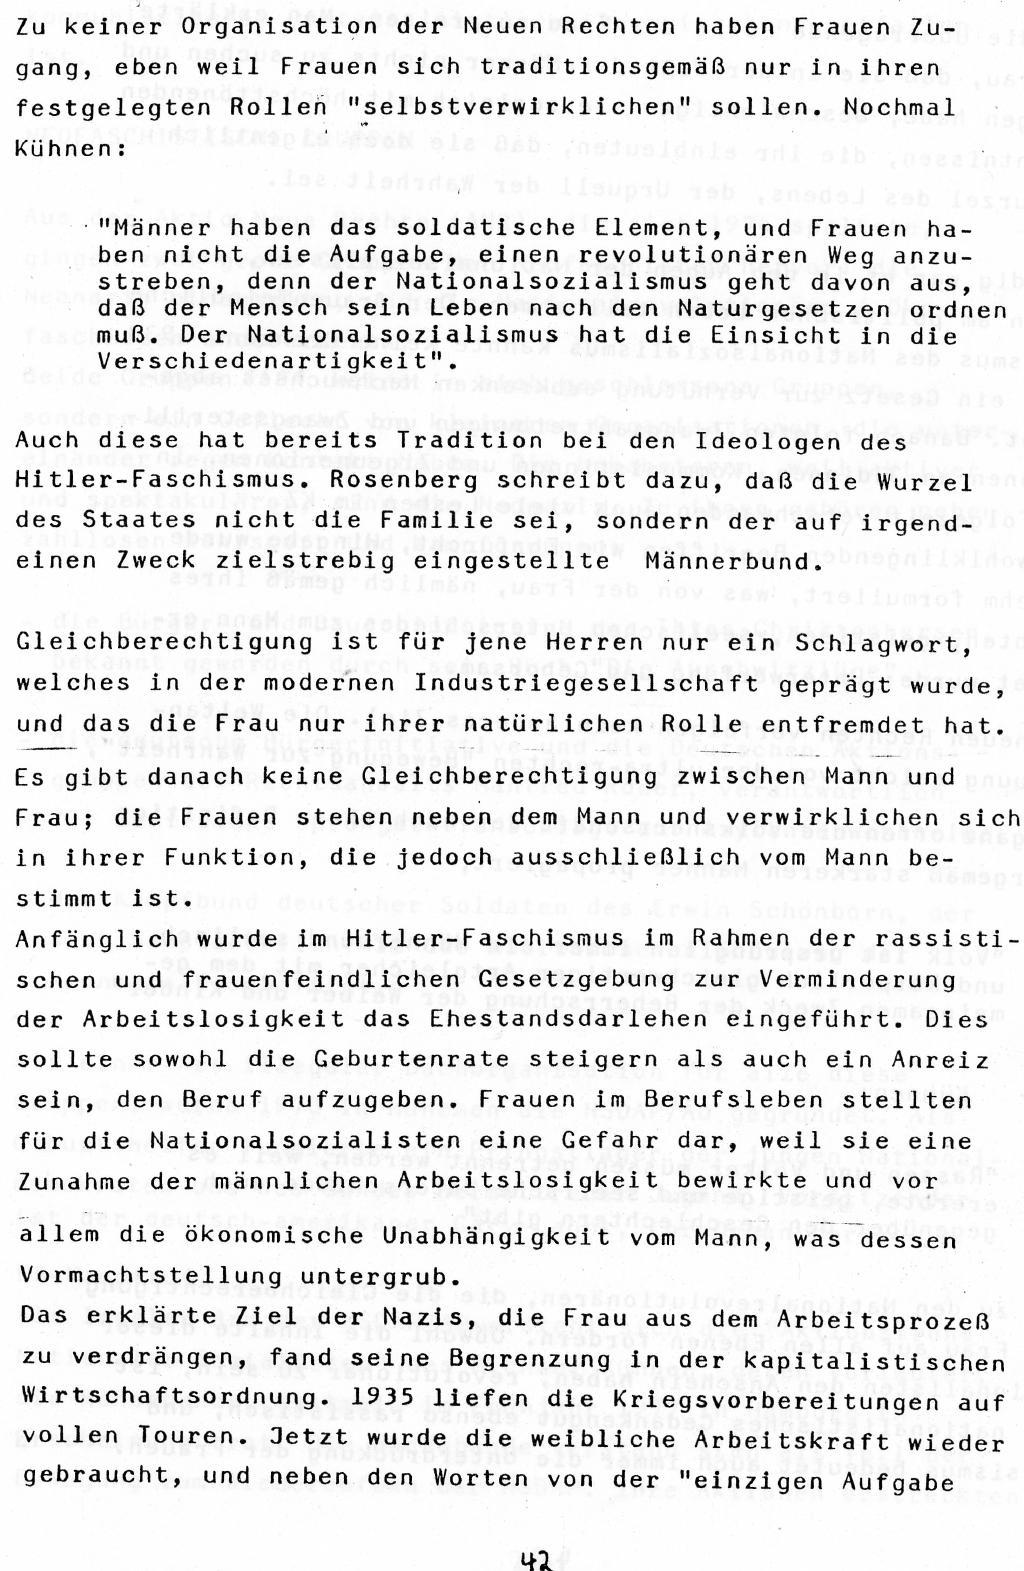 Berlin_1983_Autonome_Gruppen_Faschismus_im_Kapitalismus_42